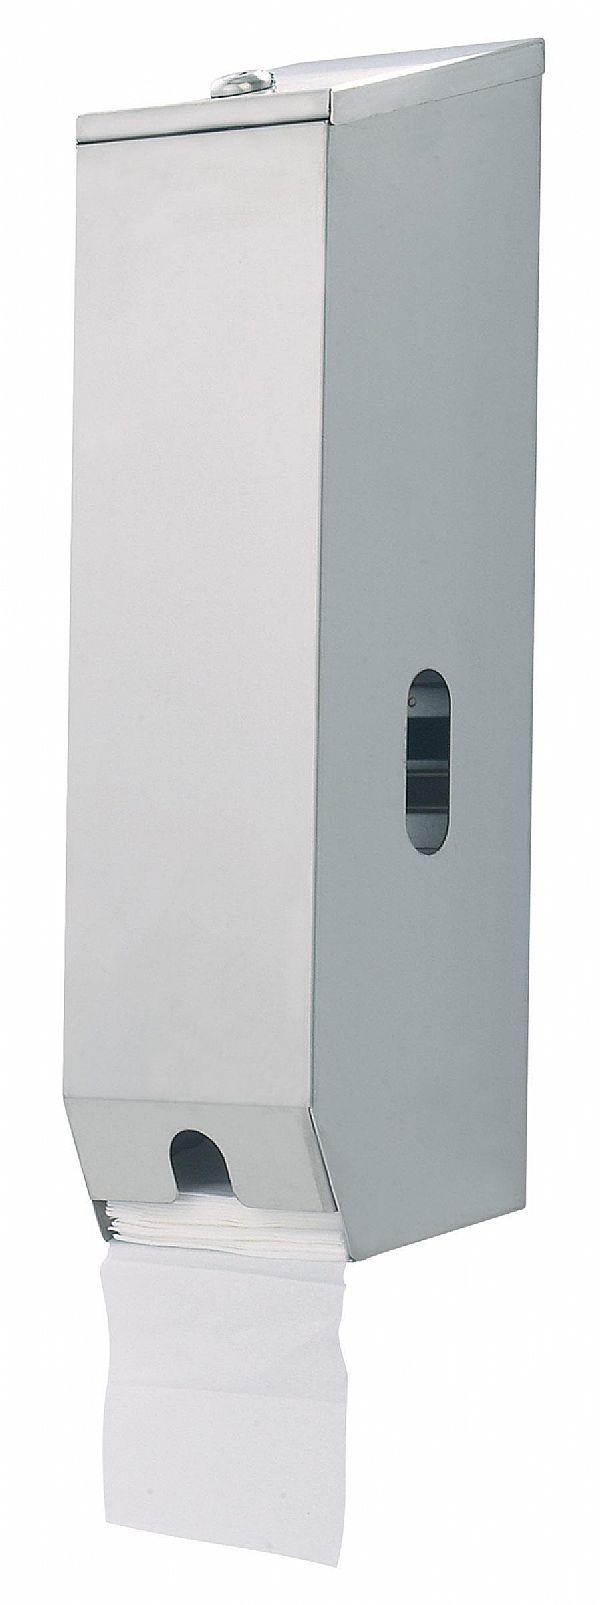 A 833 Toilet Roll Dispenser Stainless Steel Satin 3